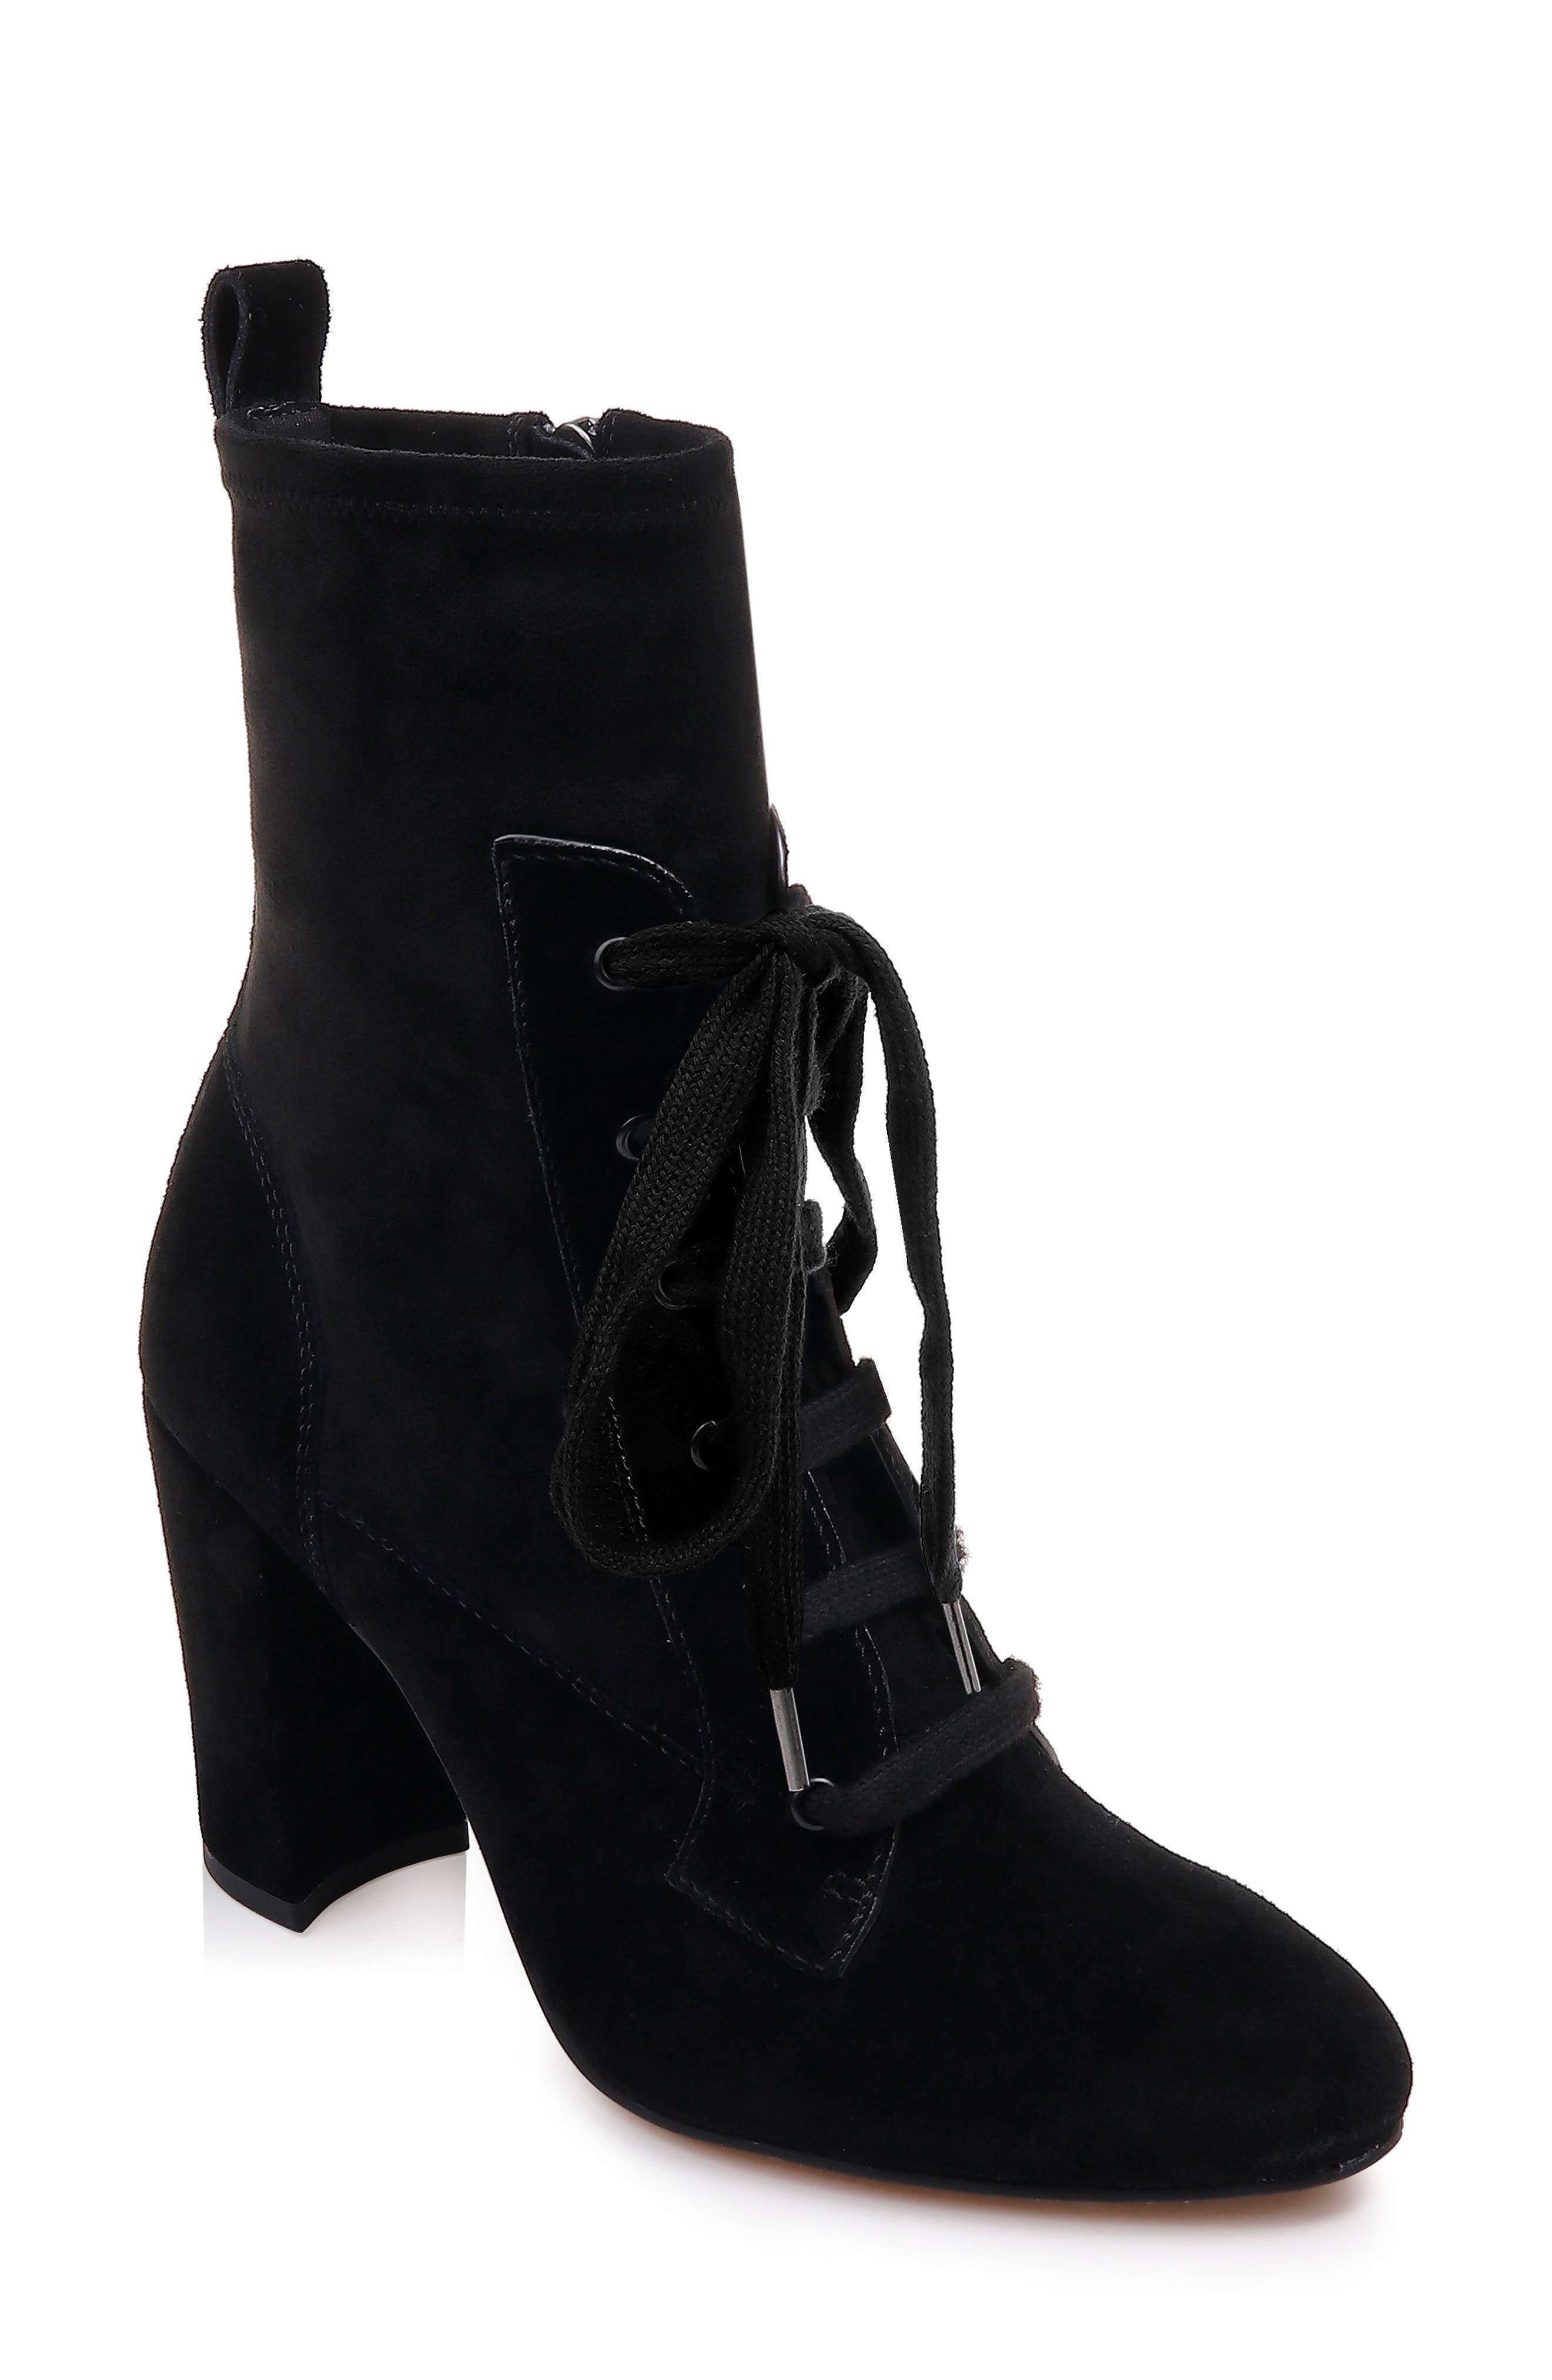 Splendid Hacken Lace-Up Boot, Black